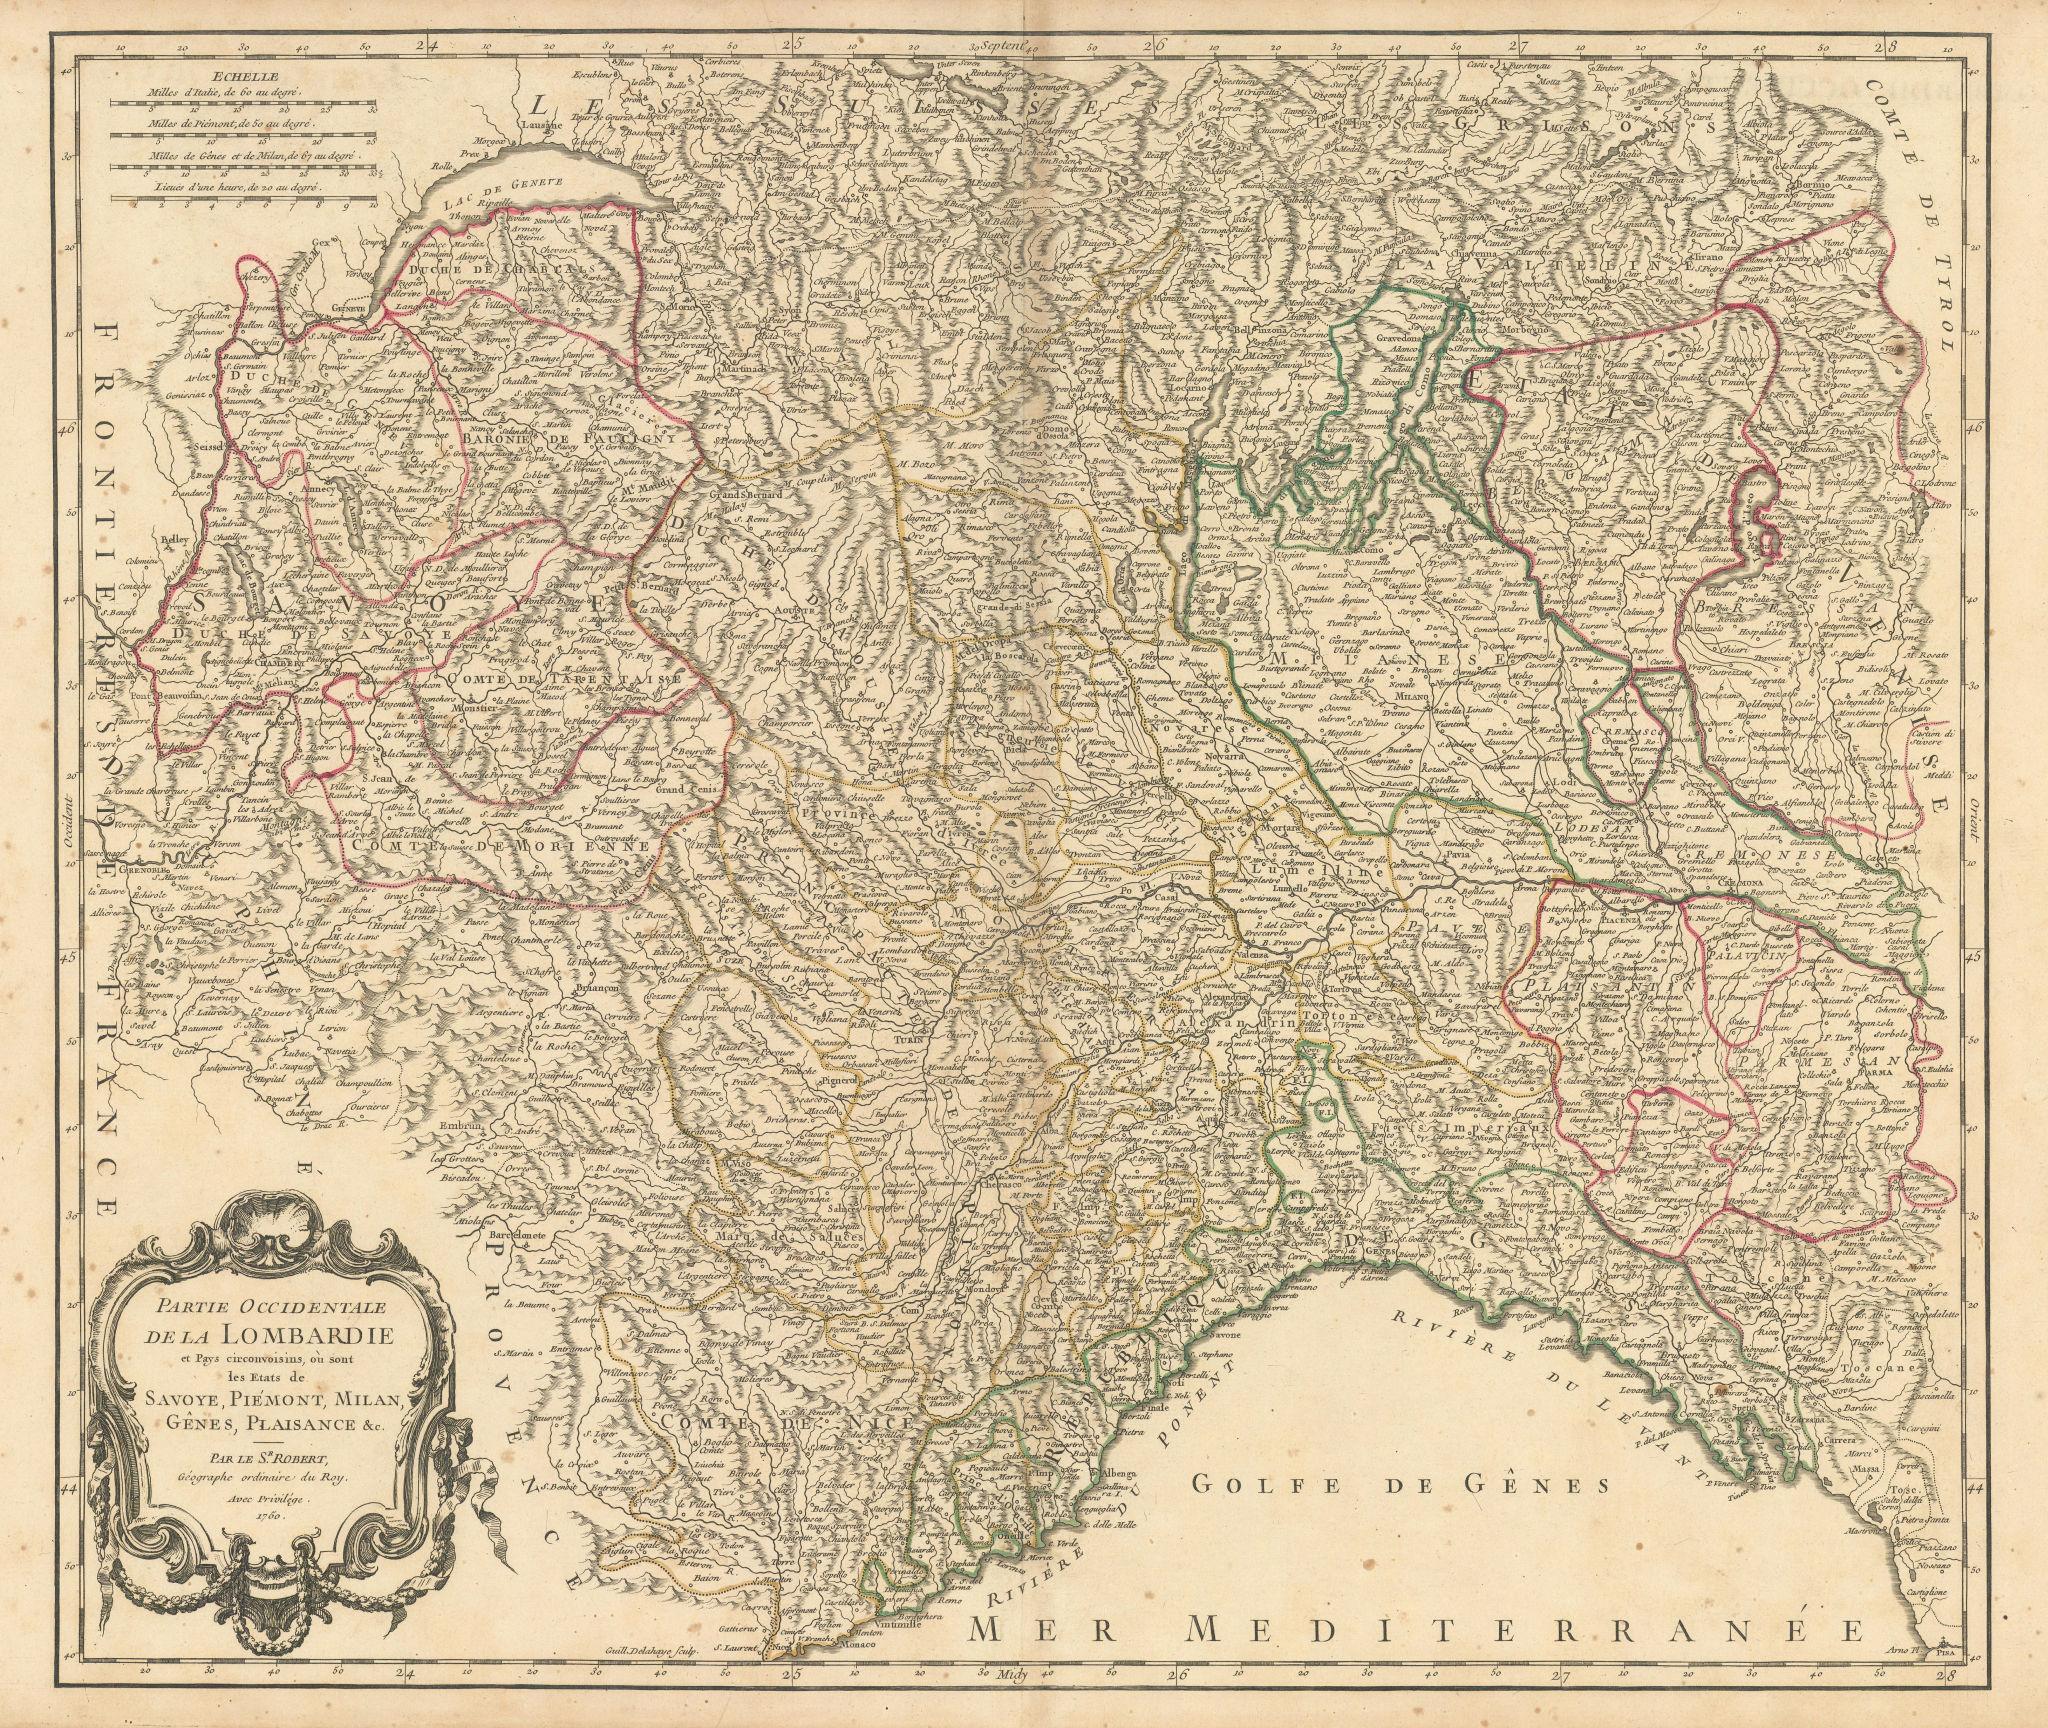 """Partie Occidentale de la Lombardie"" NW Italy Liguria Piedmont VAUGONDY 1750 map"